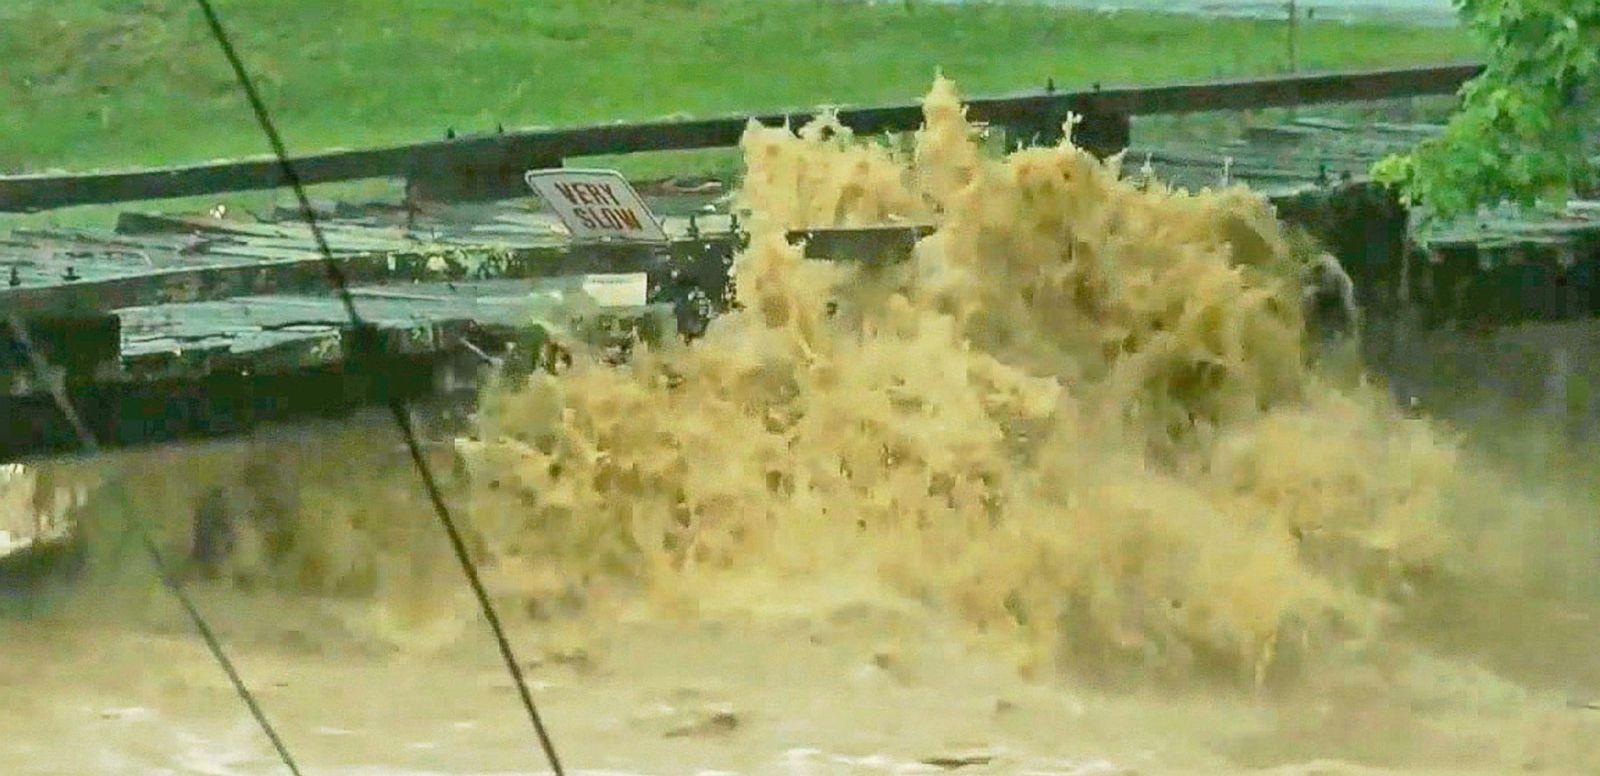 VIDEO: West Virginia Residents Battle Severe Flooding